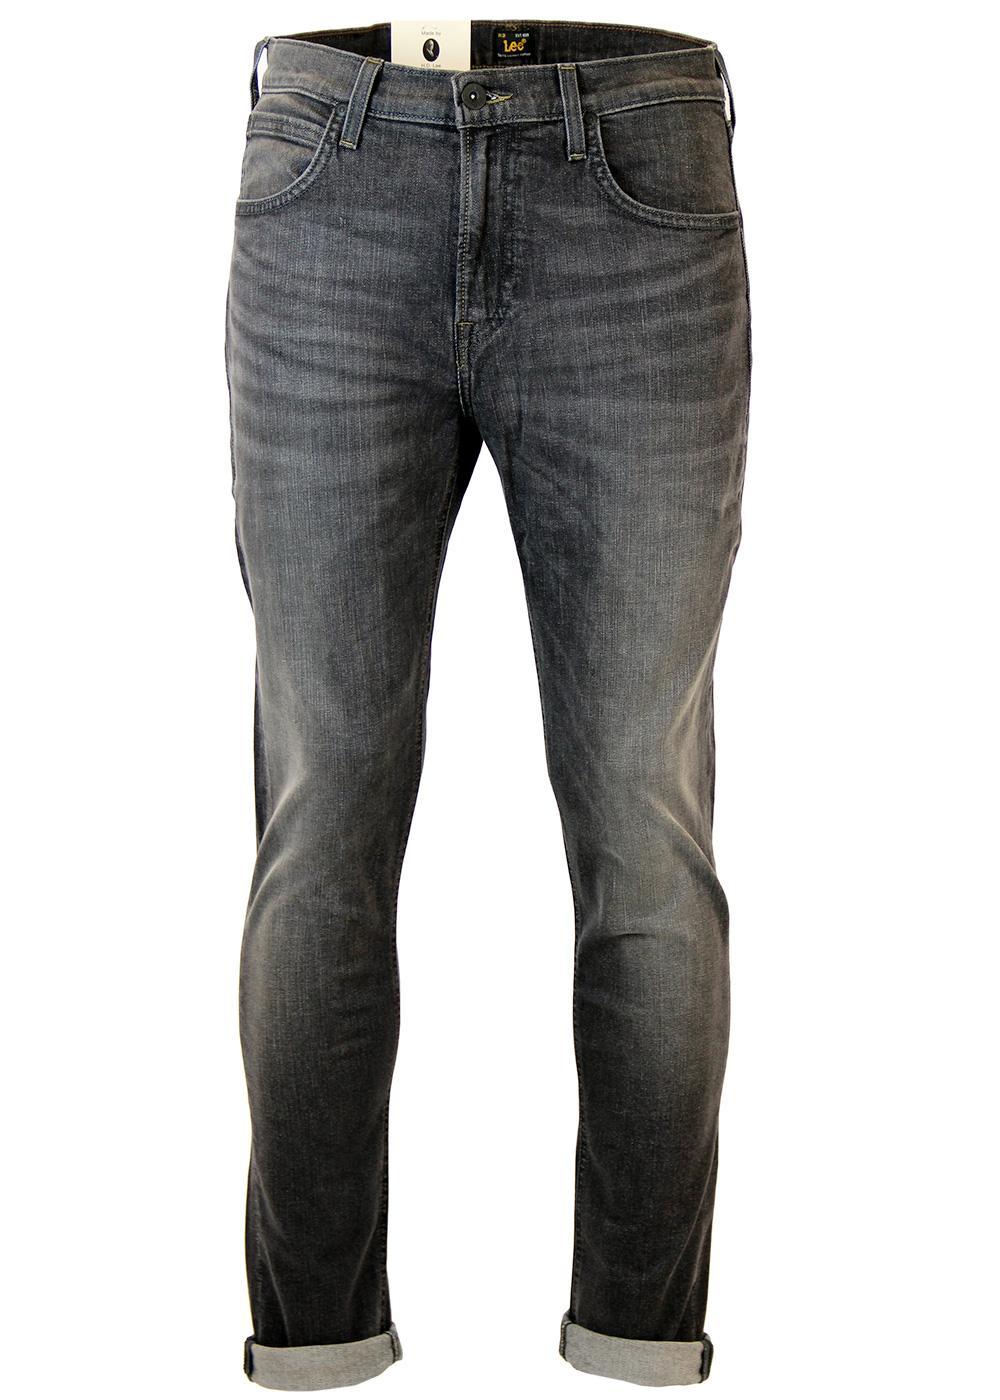 4a5df2a4 LEE Arvin Retro 70s Mod Grey Worn Denim Regular Tapered Jeans